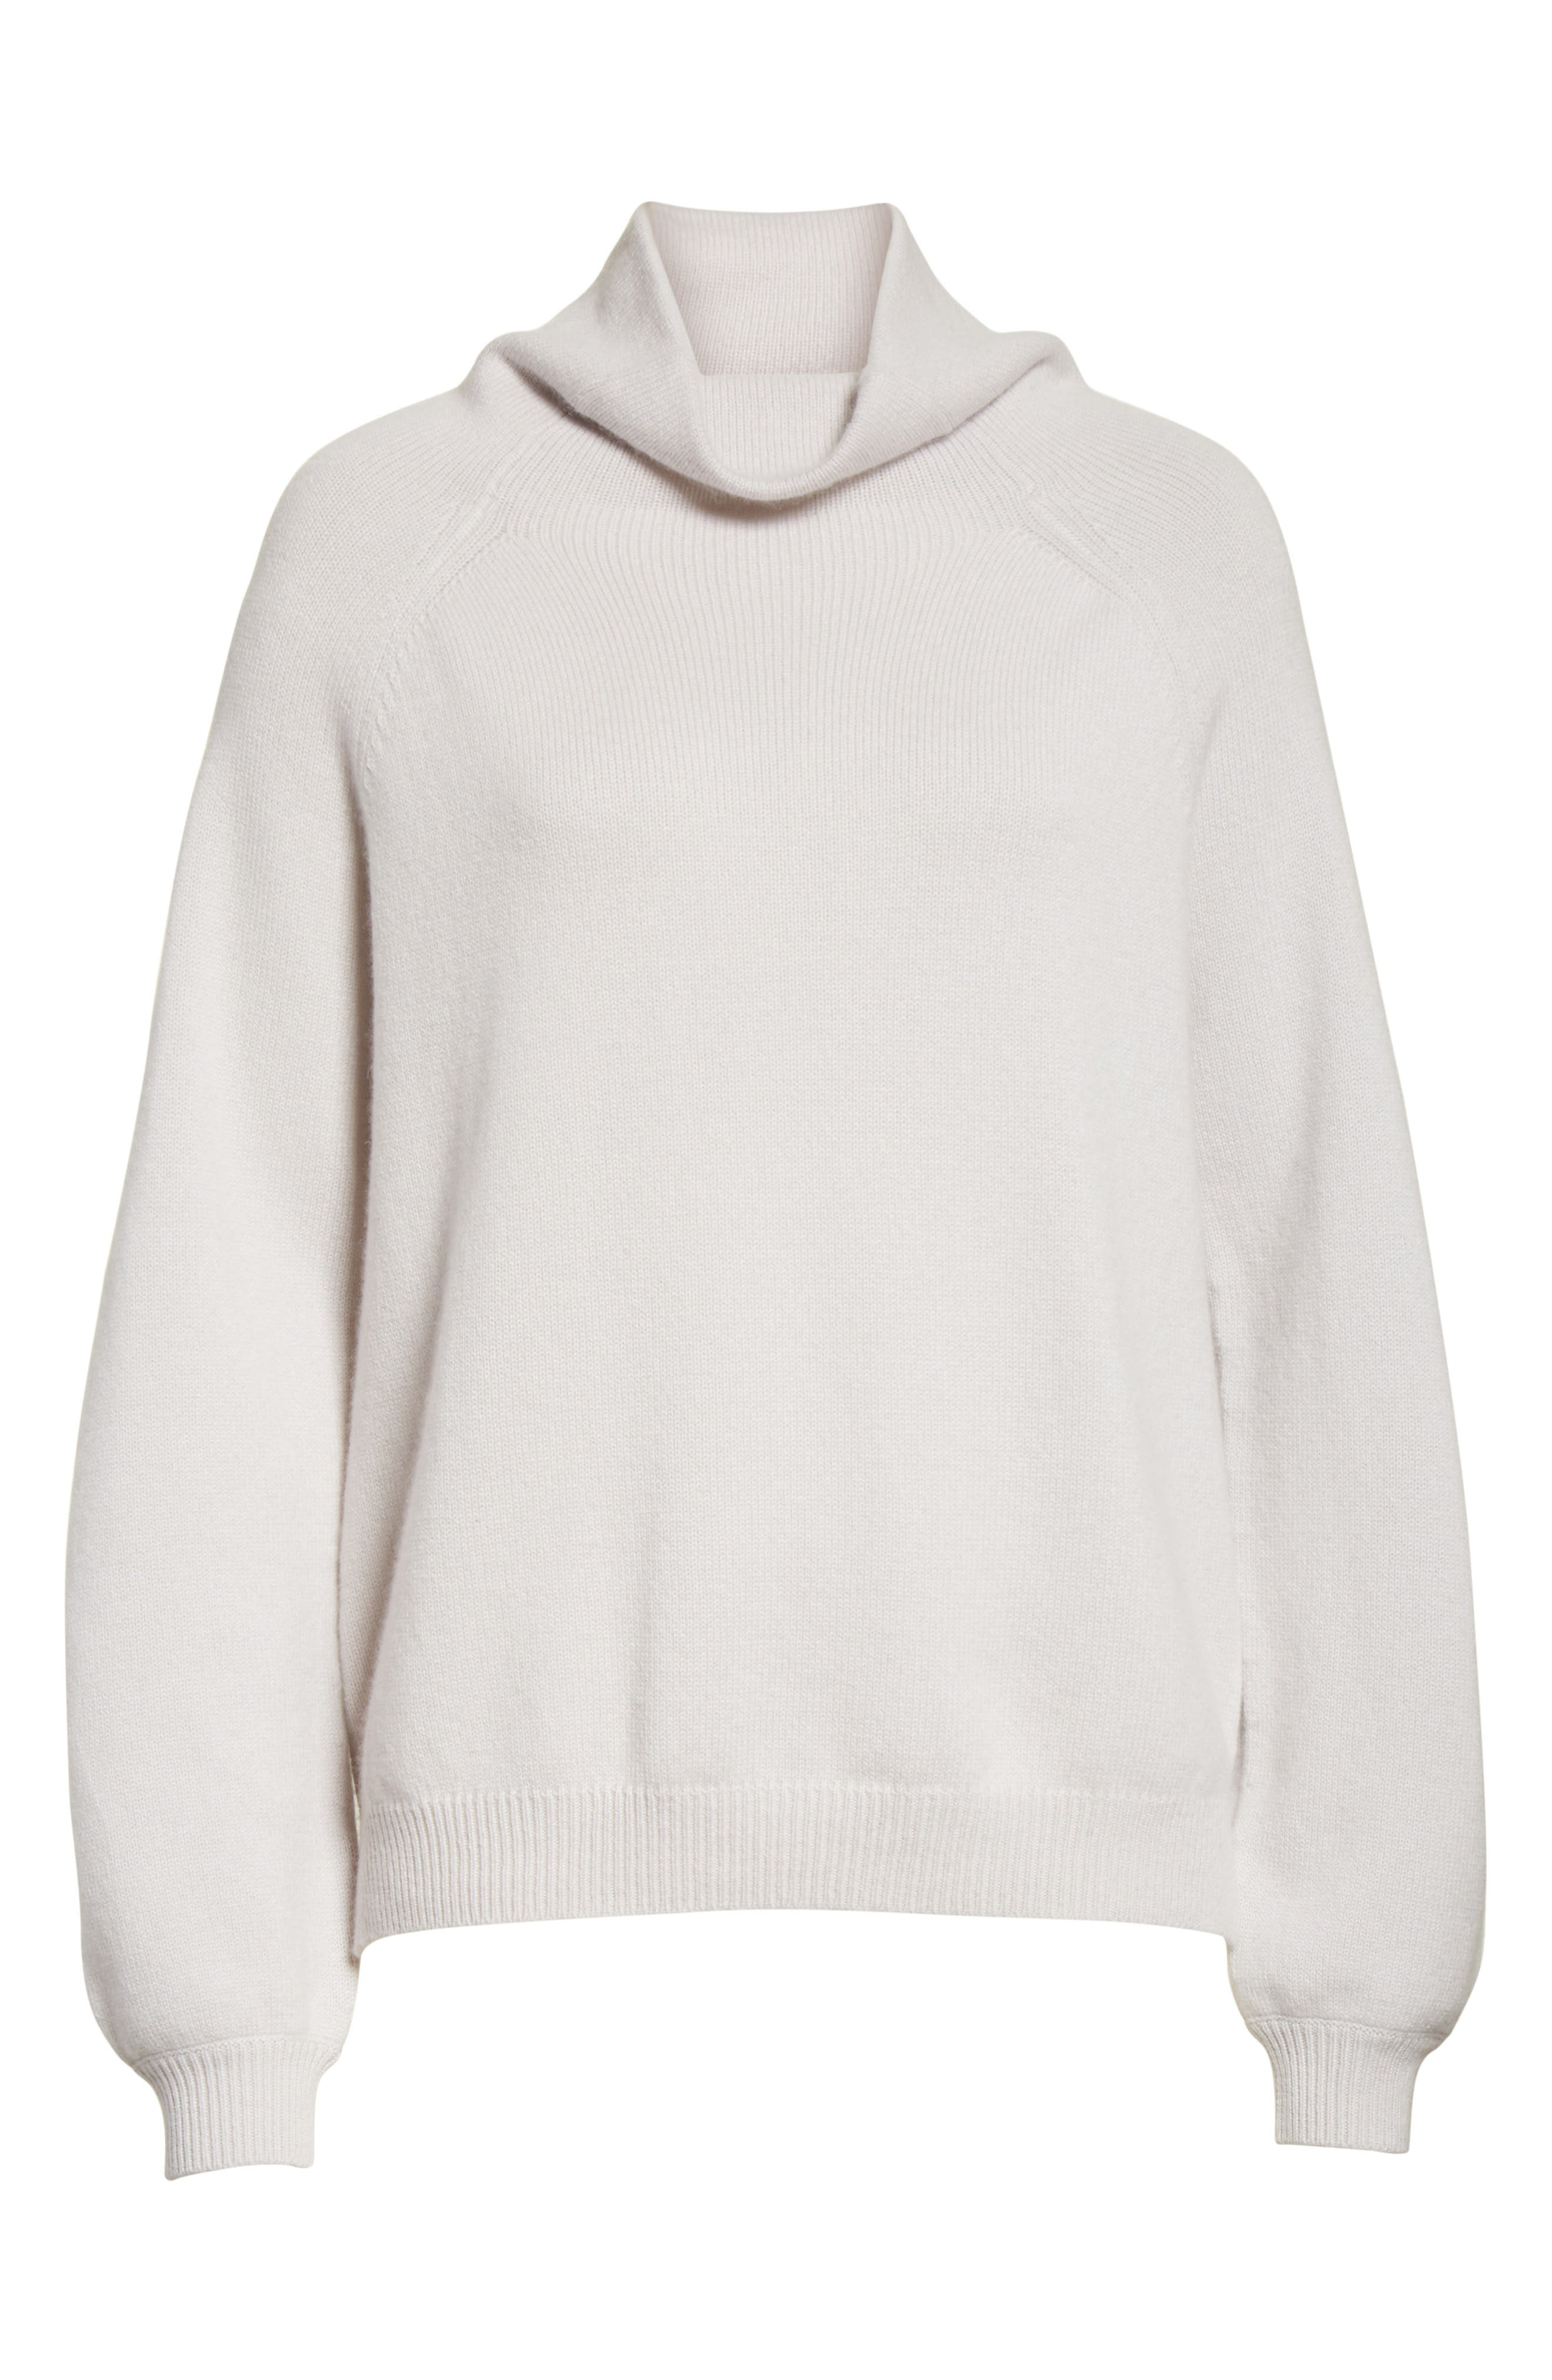 Balloon Sleeve Cashmere Turtleneck Sweater,                             Alternate thumbnail 6, color,                             020